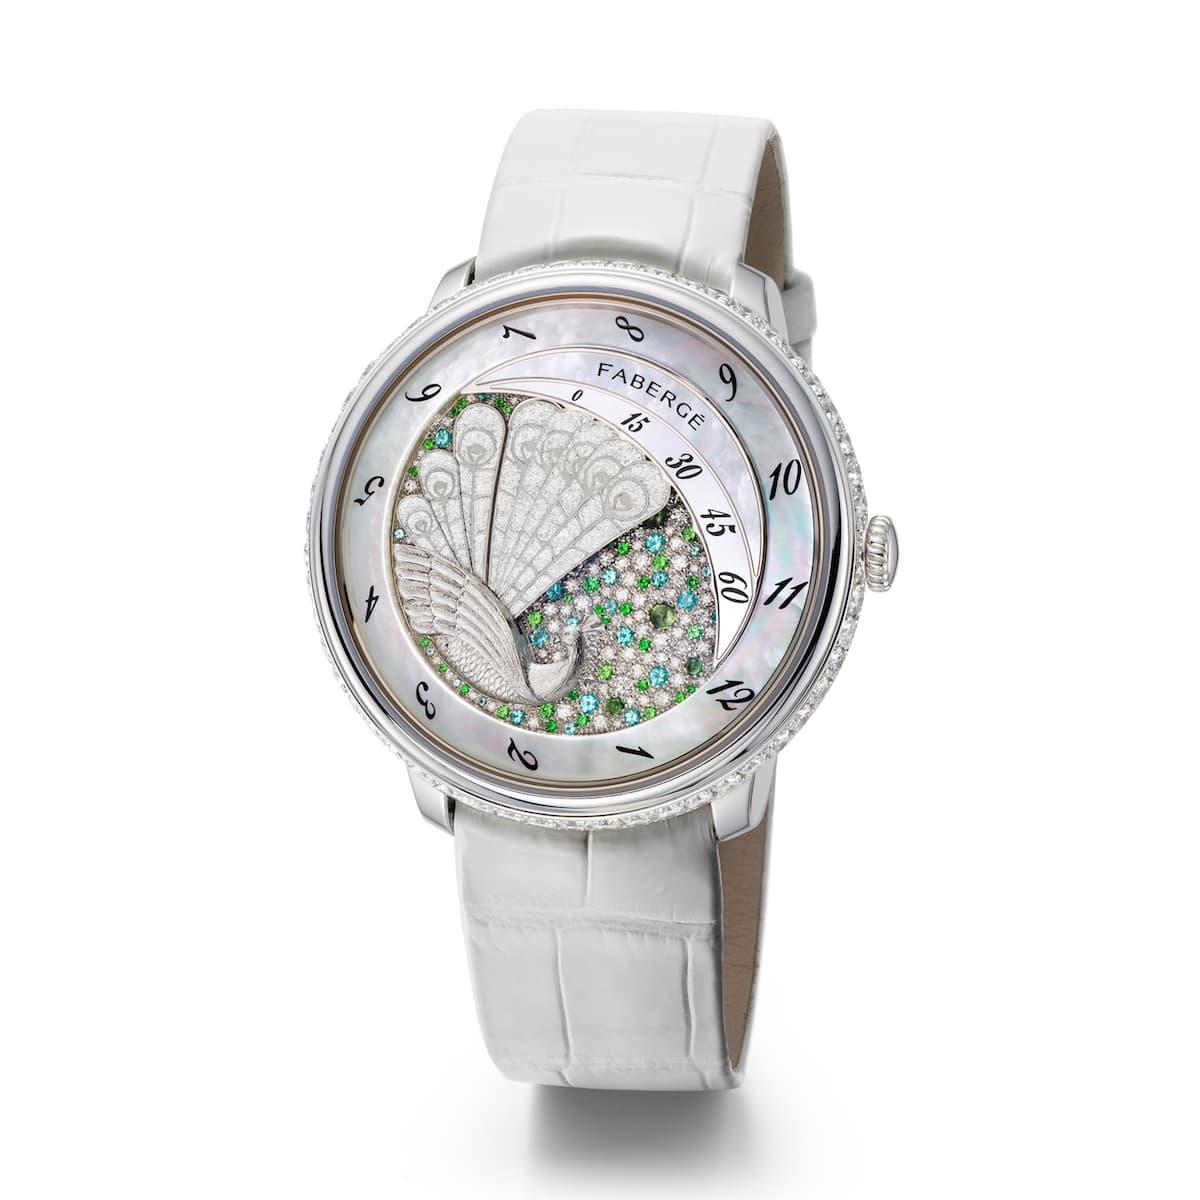 Produkt WA Lady Compliquee Peacock Watch